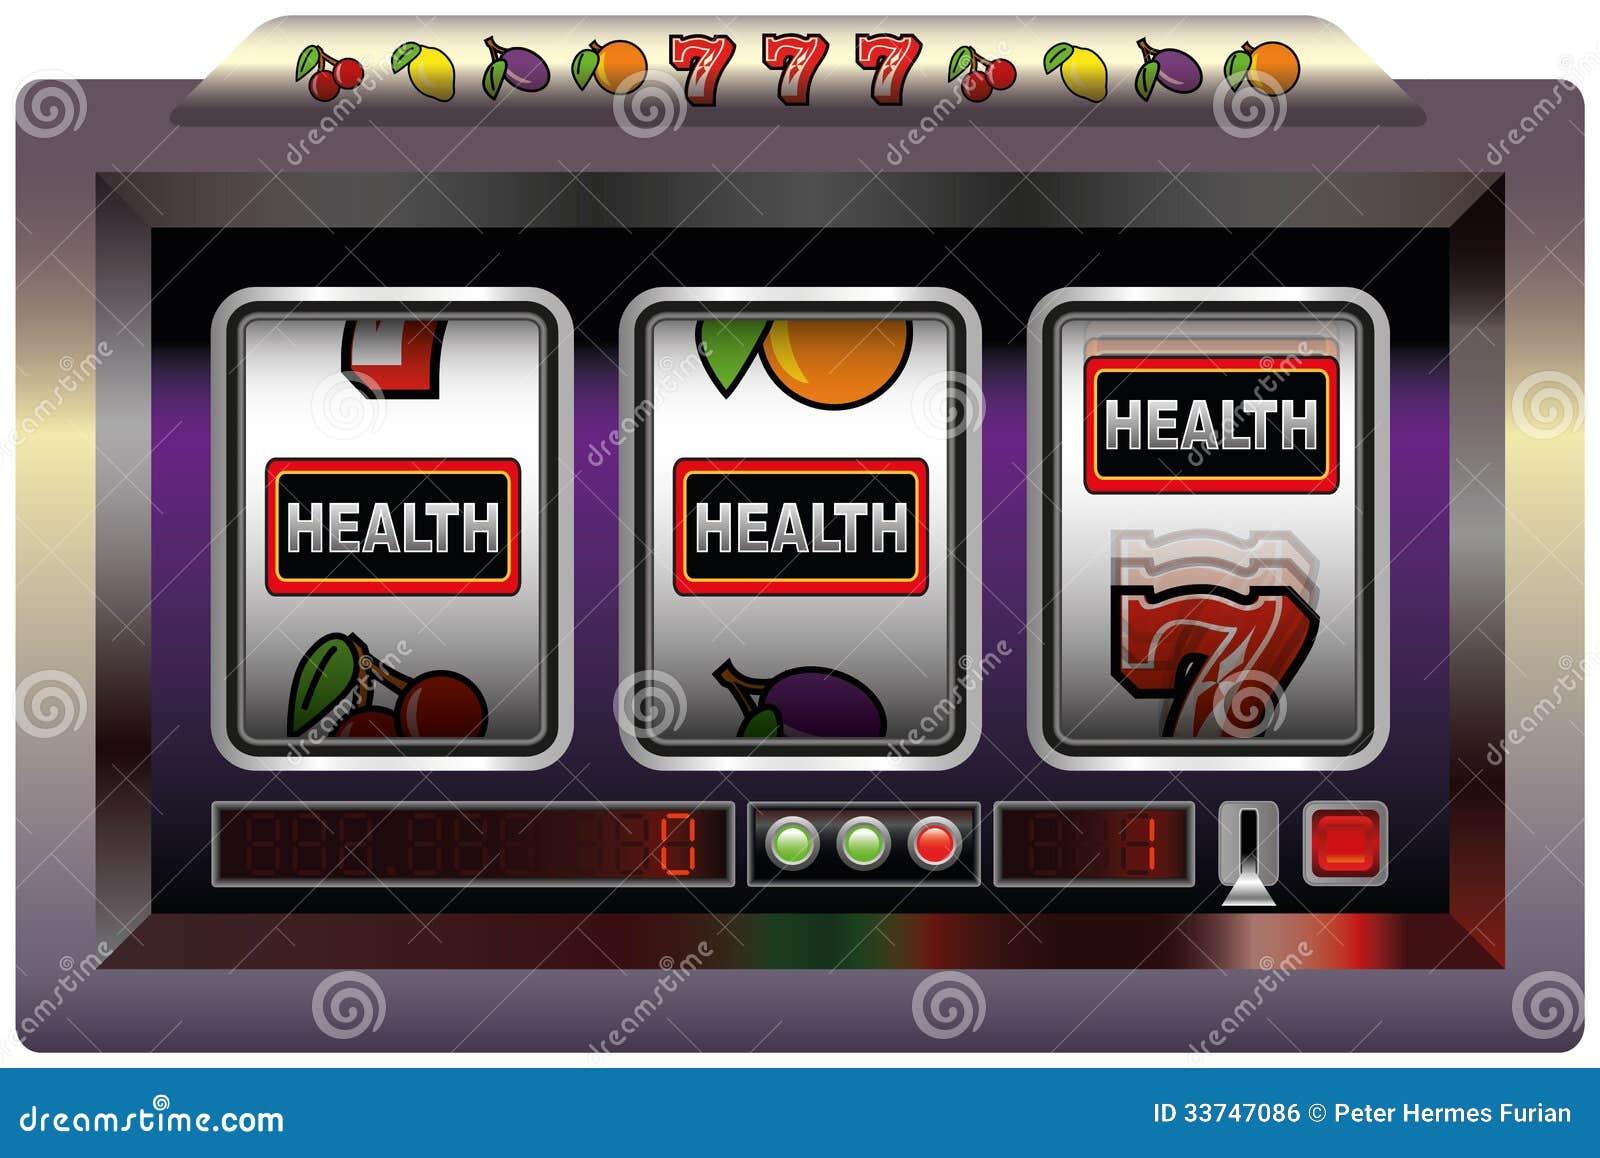 Slot machine background